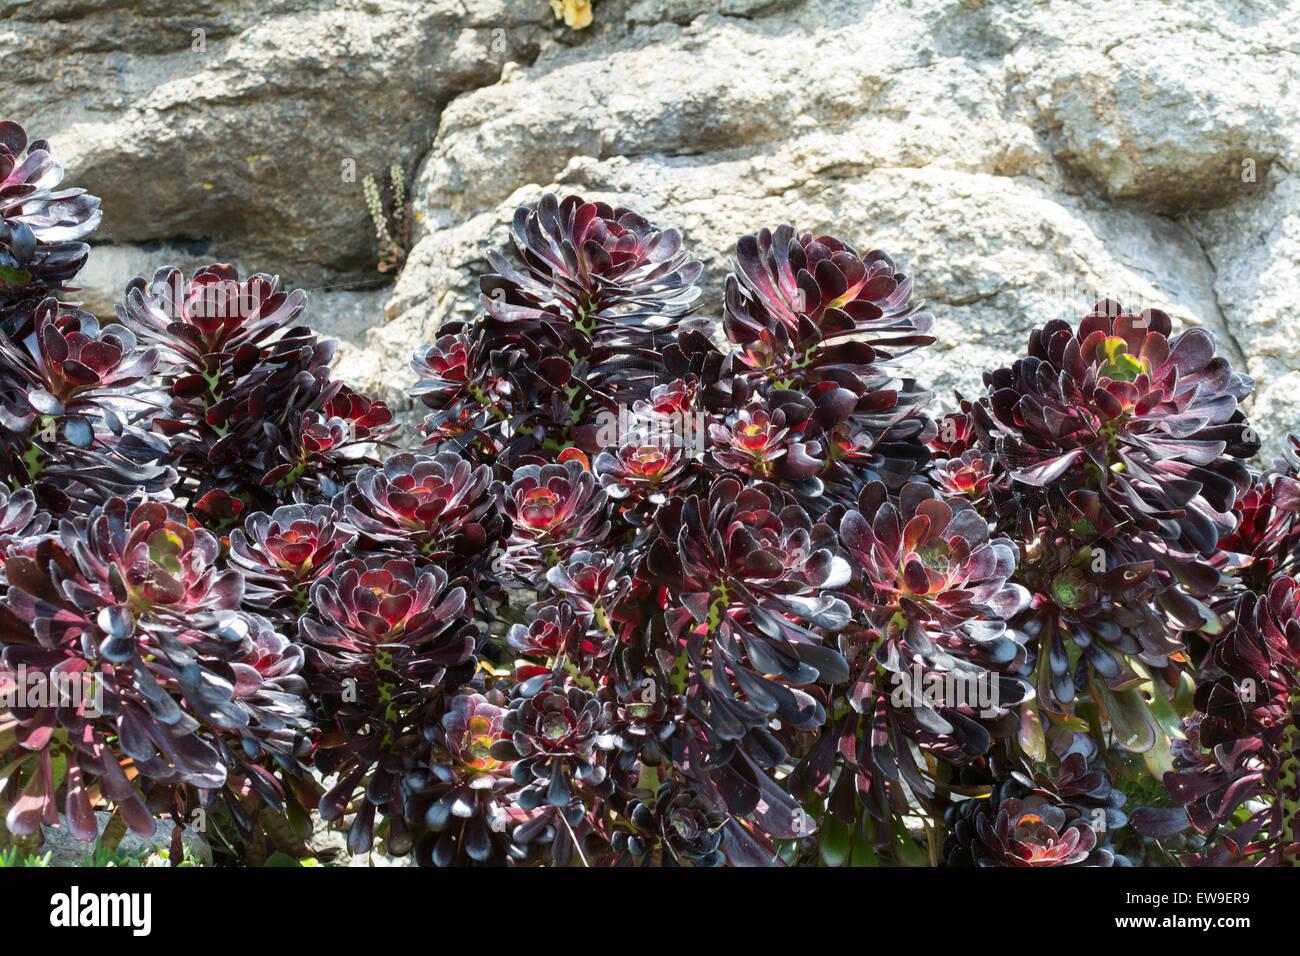 Dunkel lila Aeoniums gegen einen weißen Felsen Stockbild